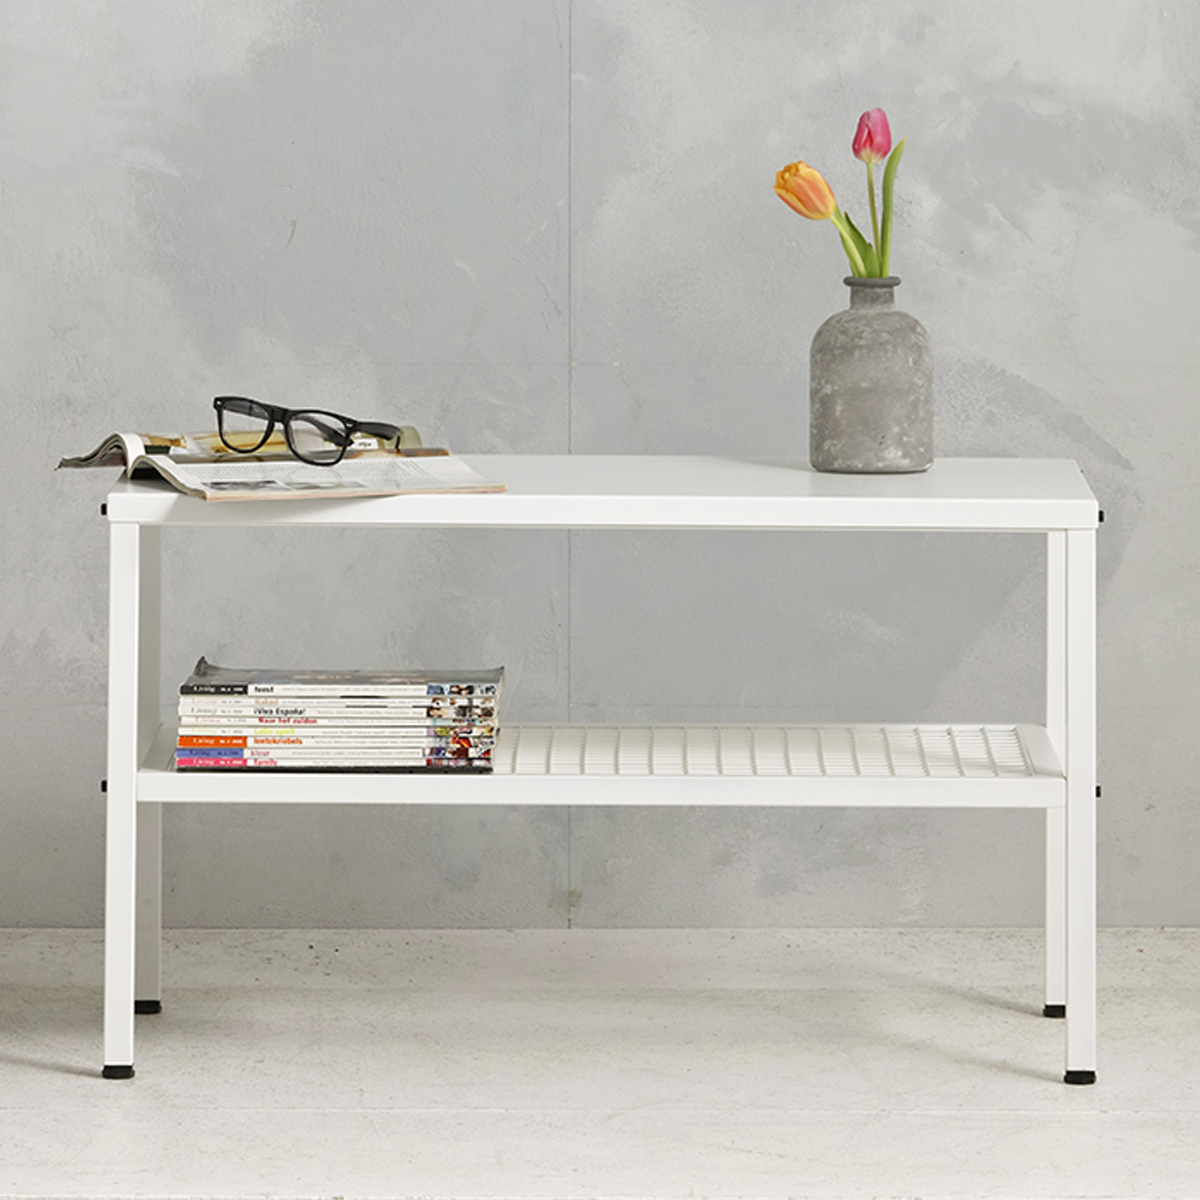 Metalen tafel industrieel - wit - 50.2x85.3x44,5 cm - LCS-110